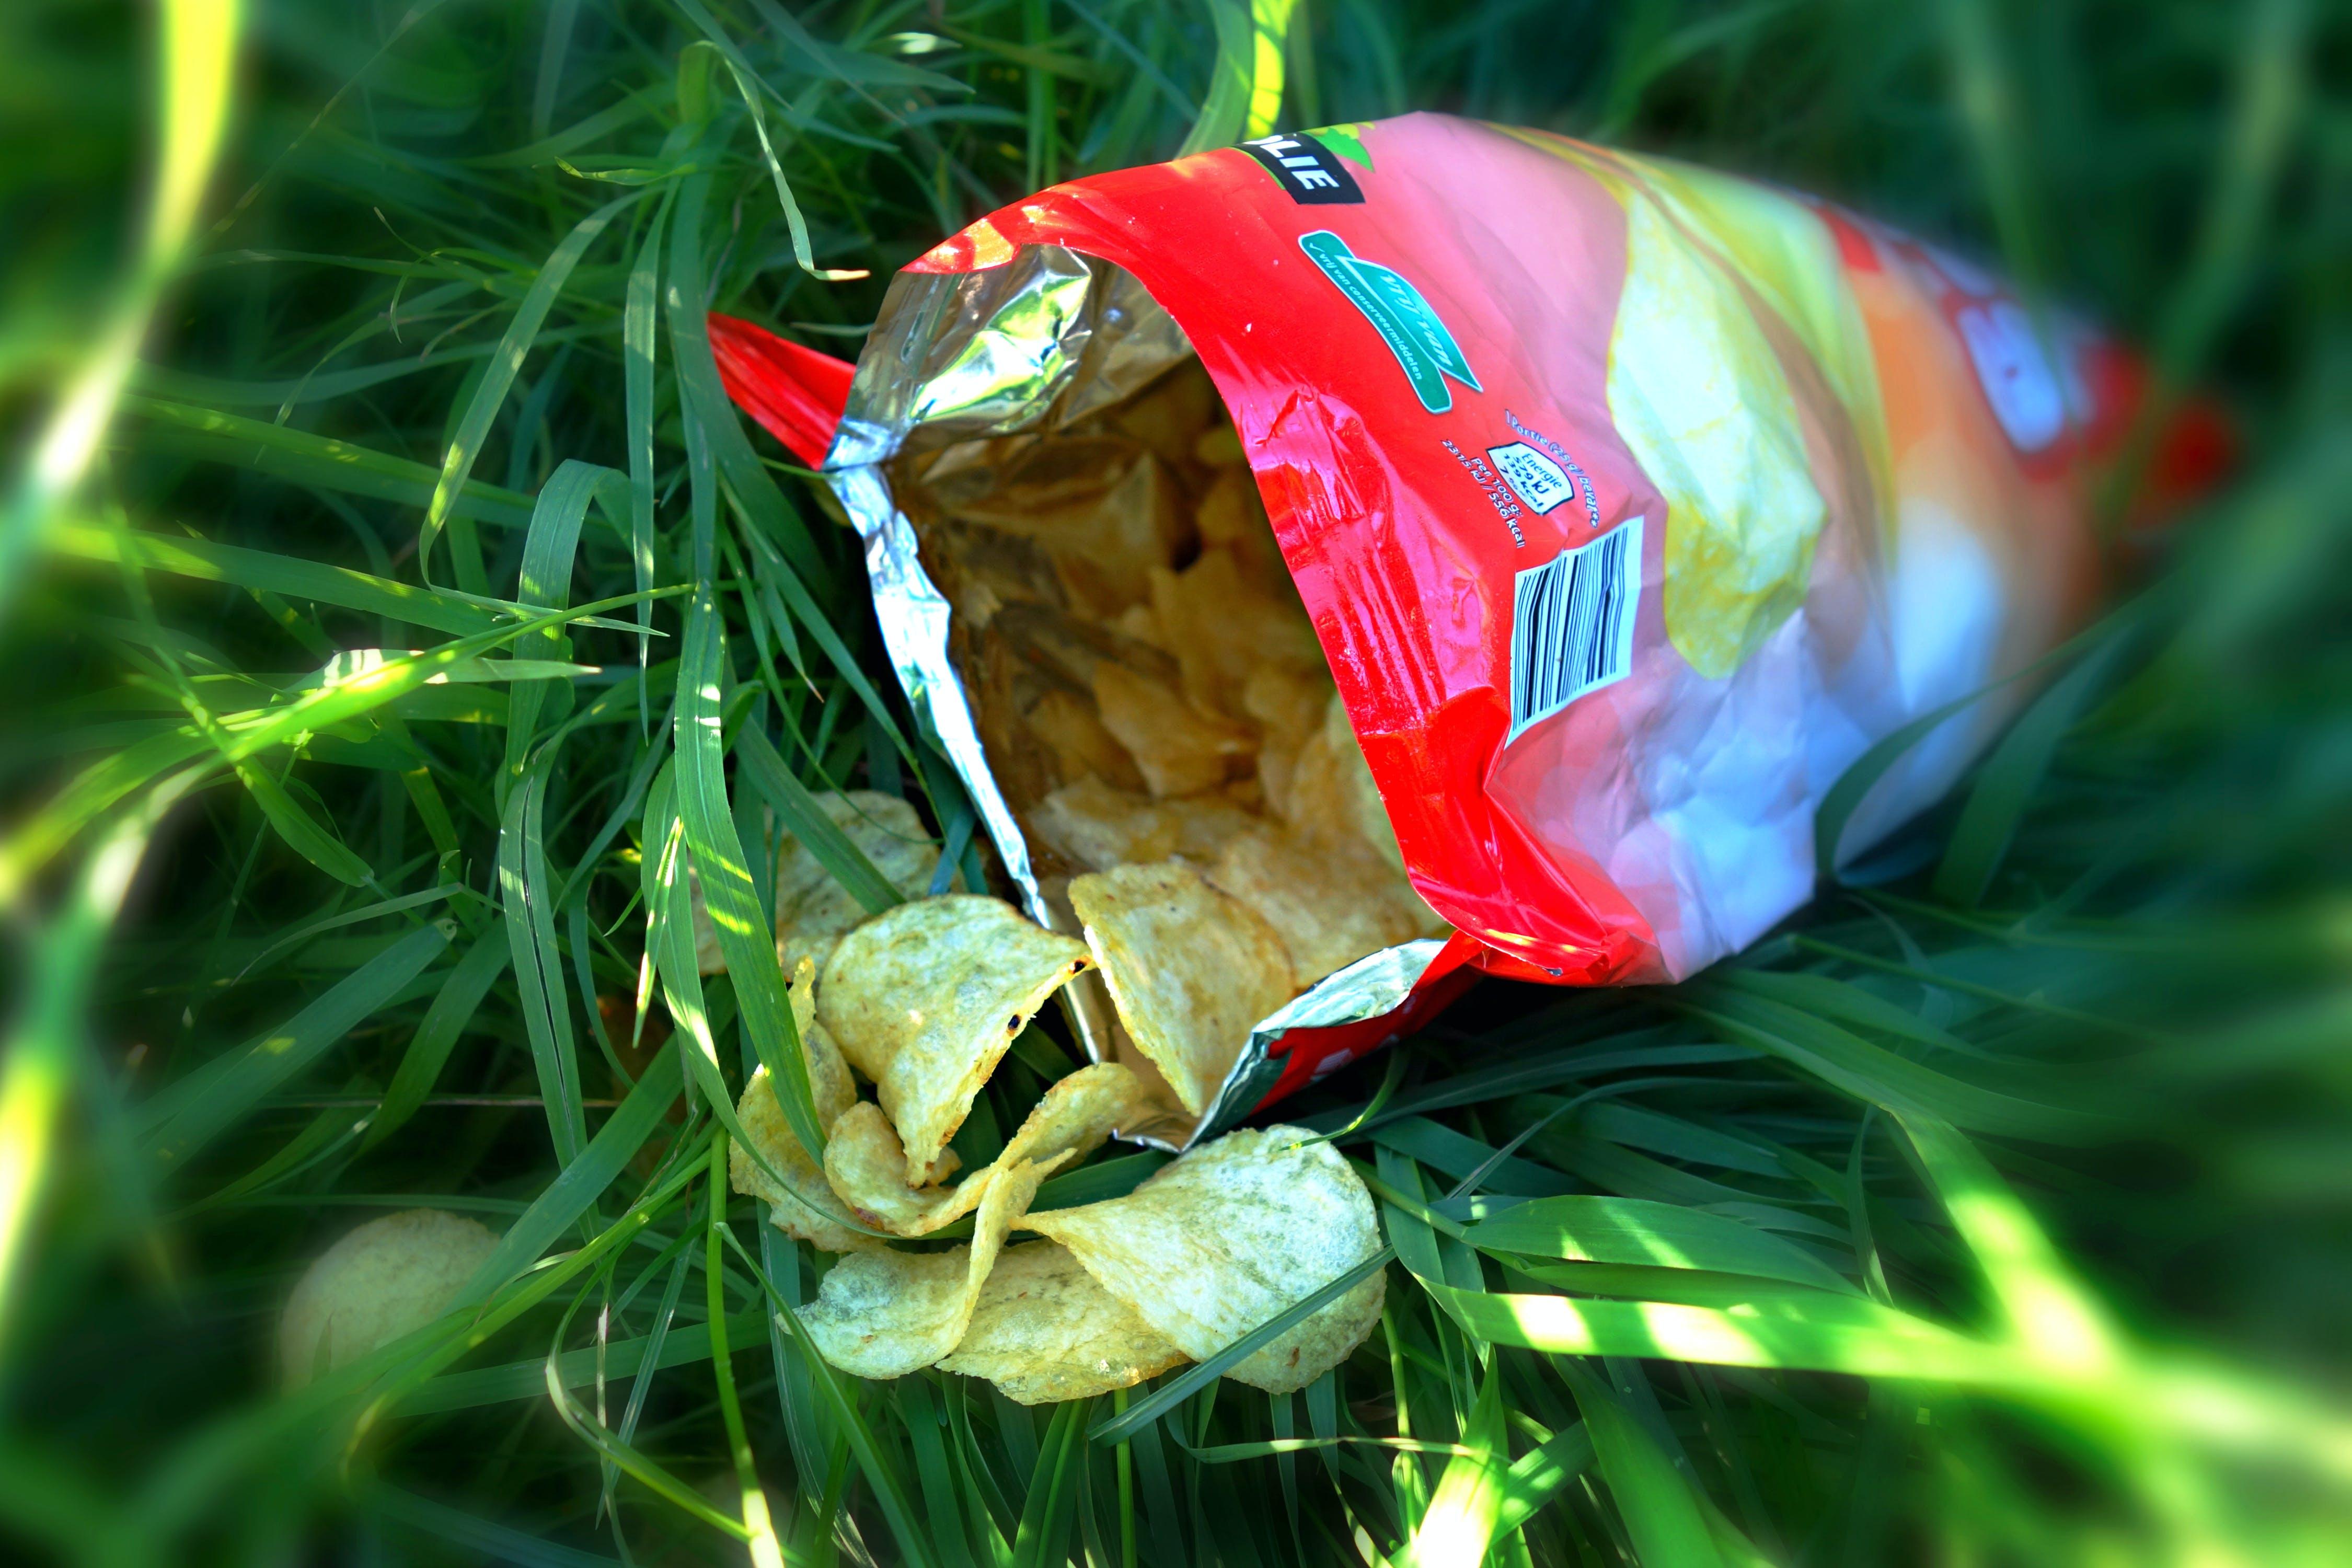 Free stock photo of unhealthy, tasty, fast-food, crisps